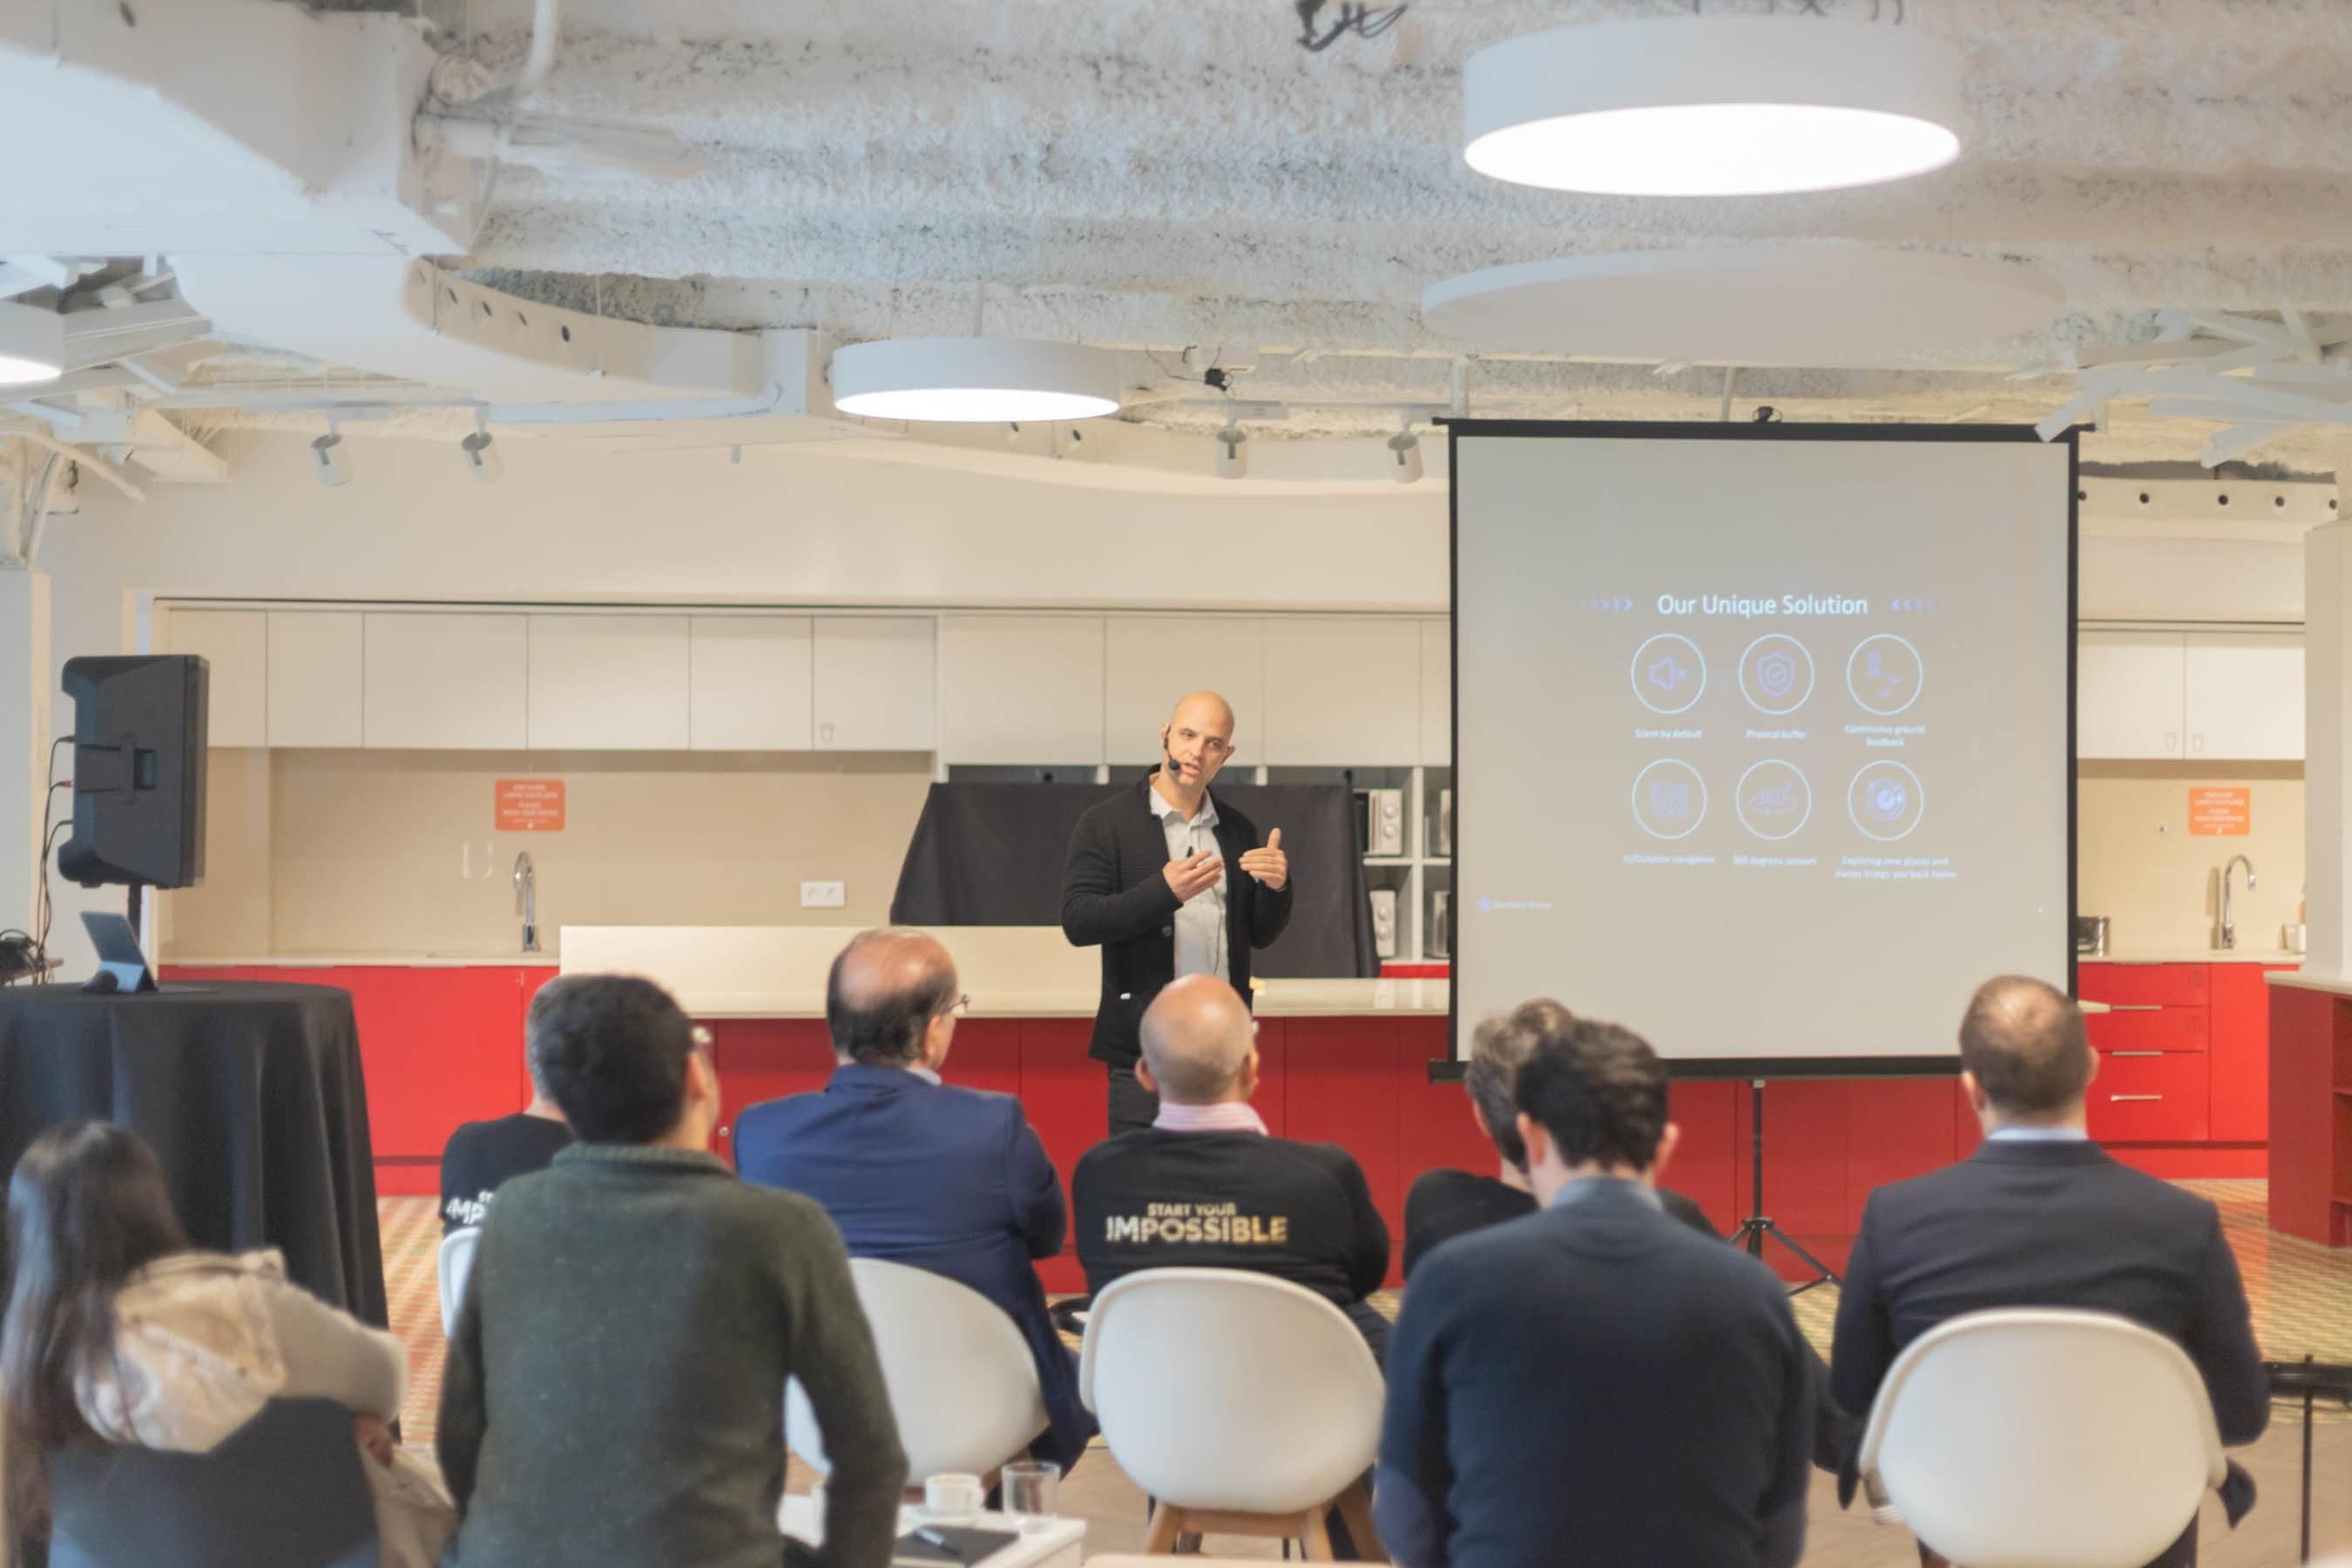 premios toyota startups en Aticco coworking